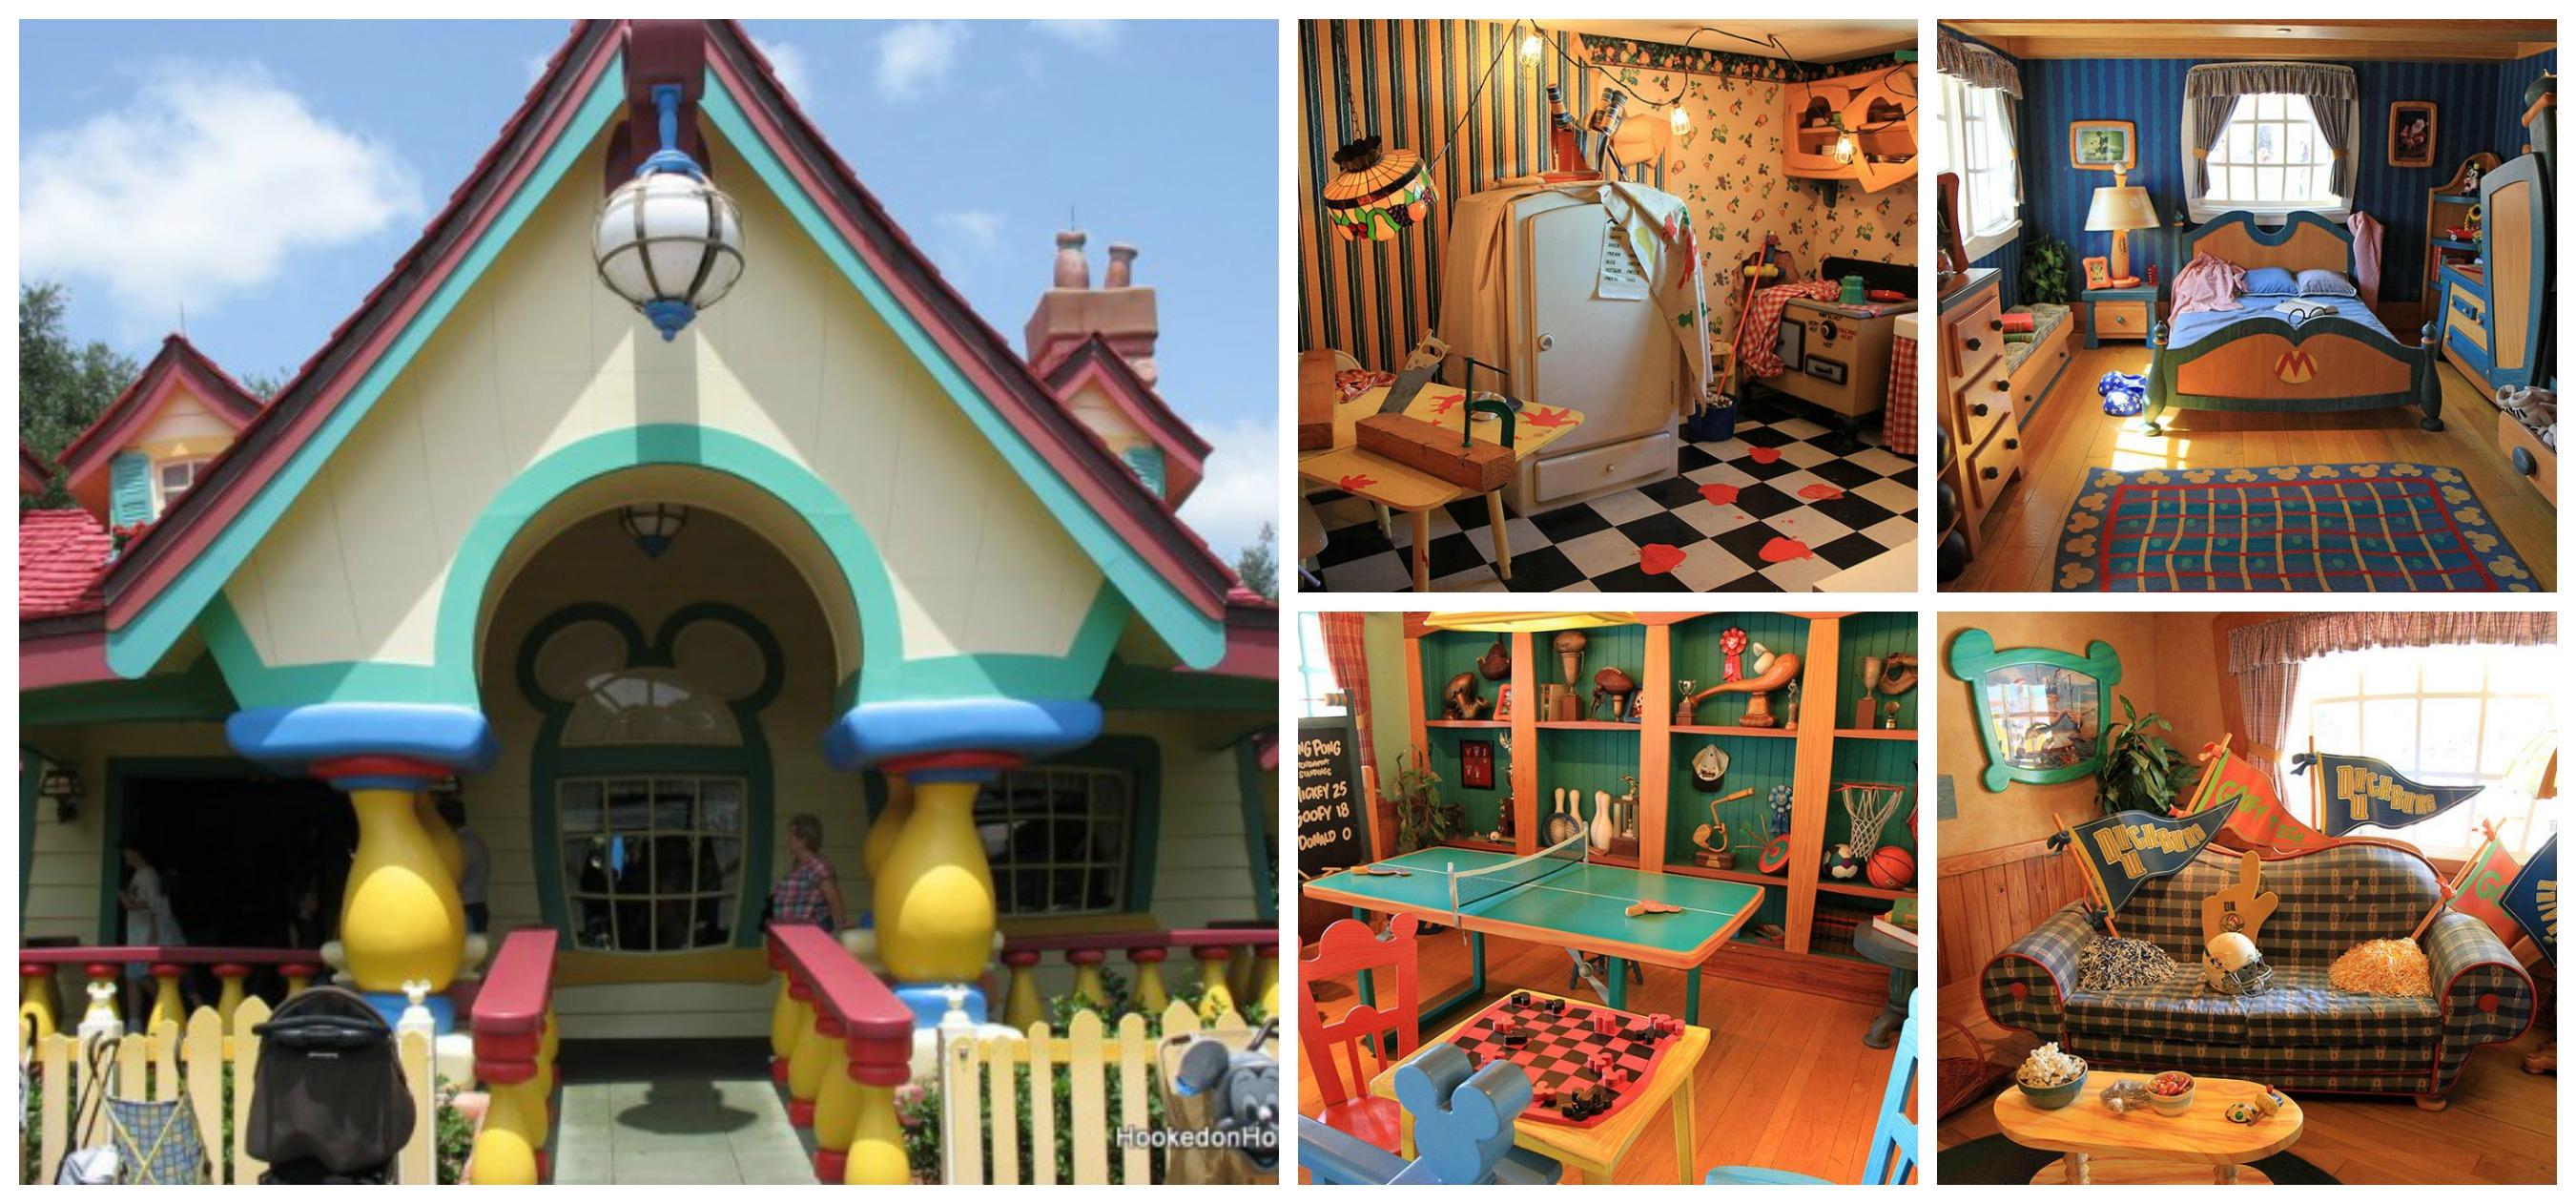 8 asombrosas casas reales inspiradas en dibujos animados - Casas de peliculas ...